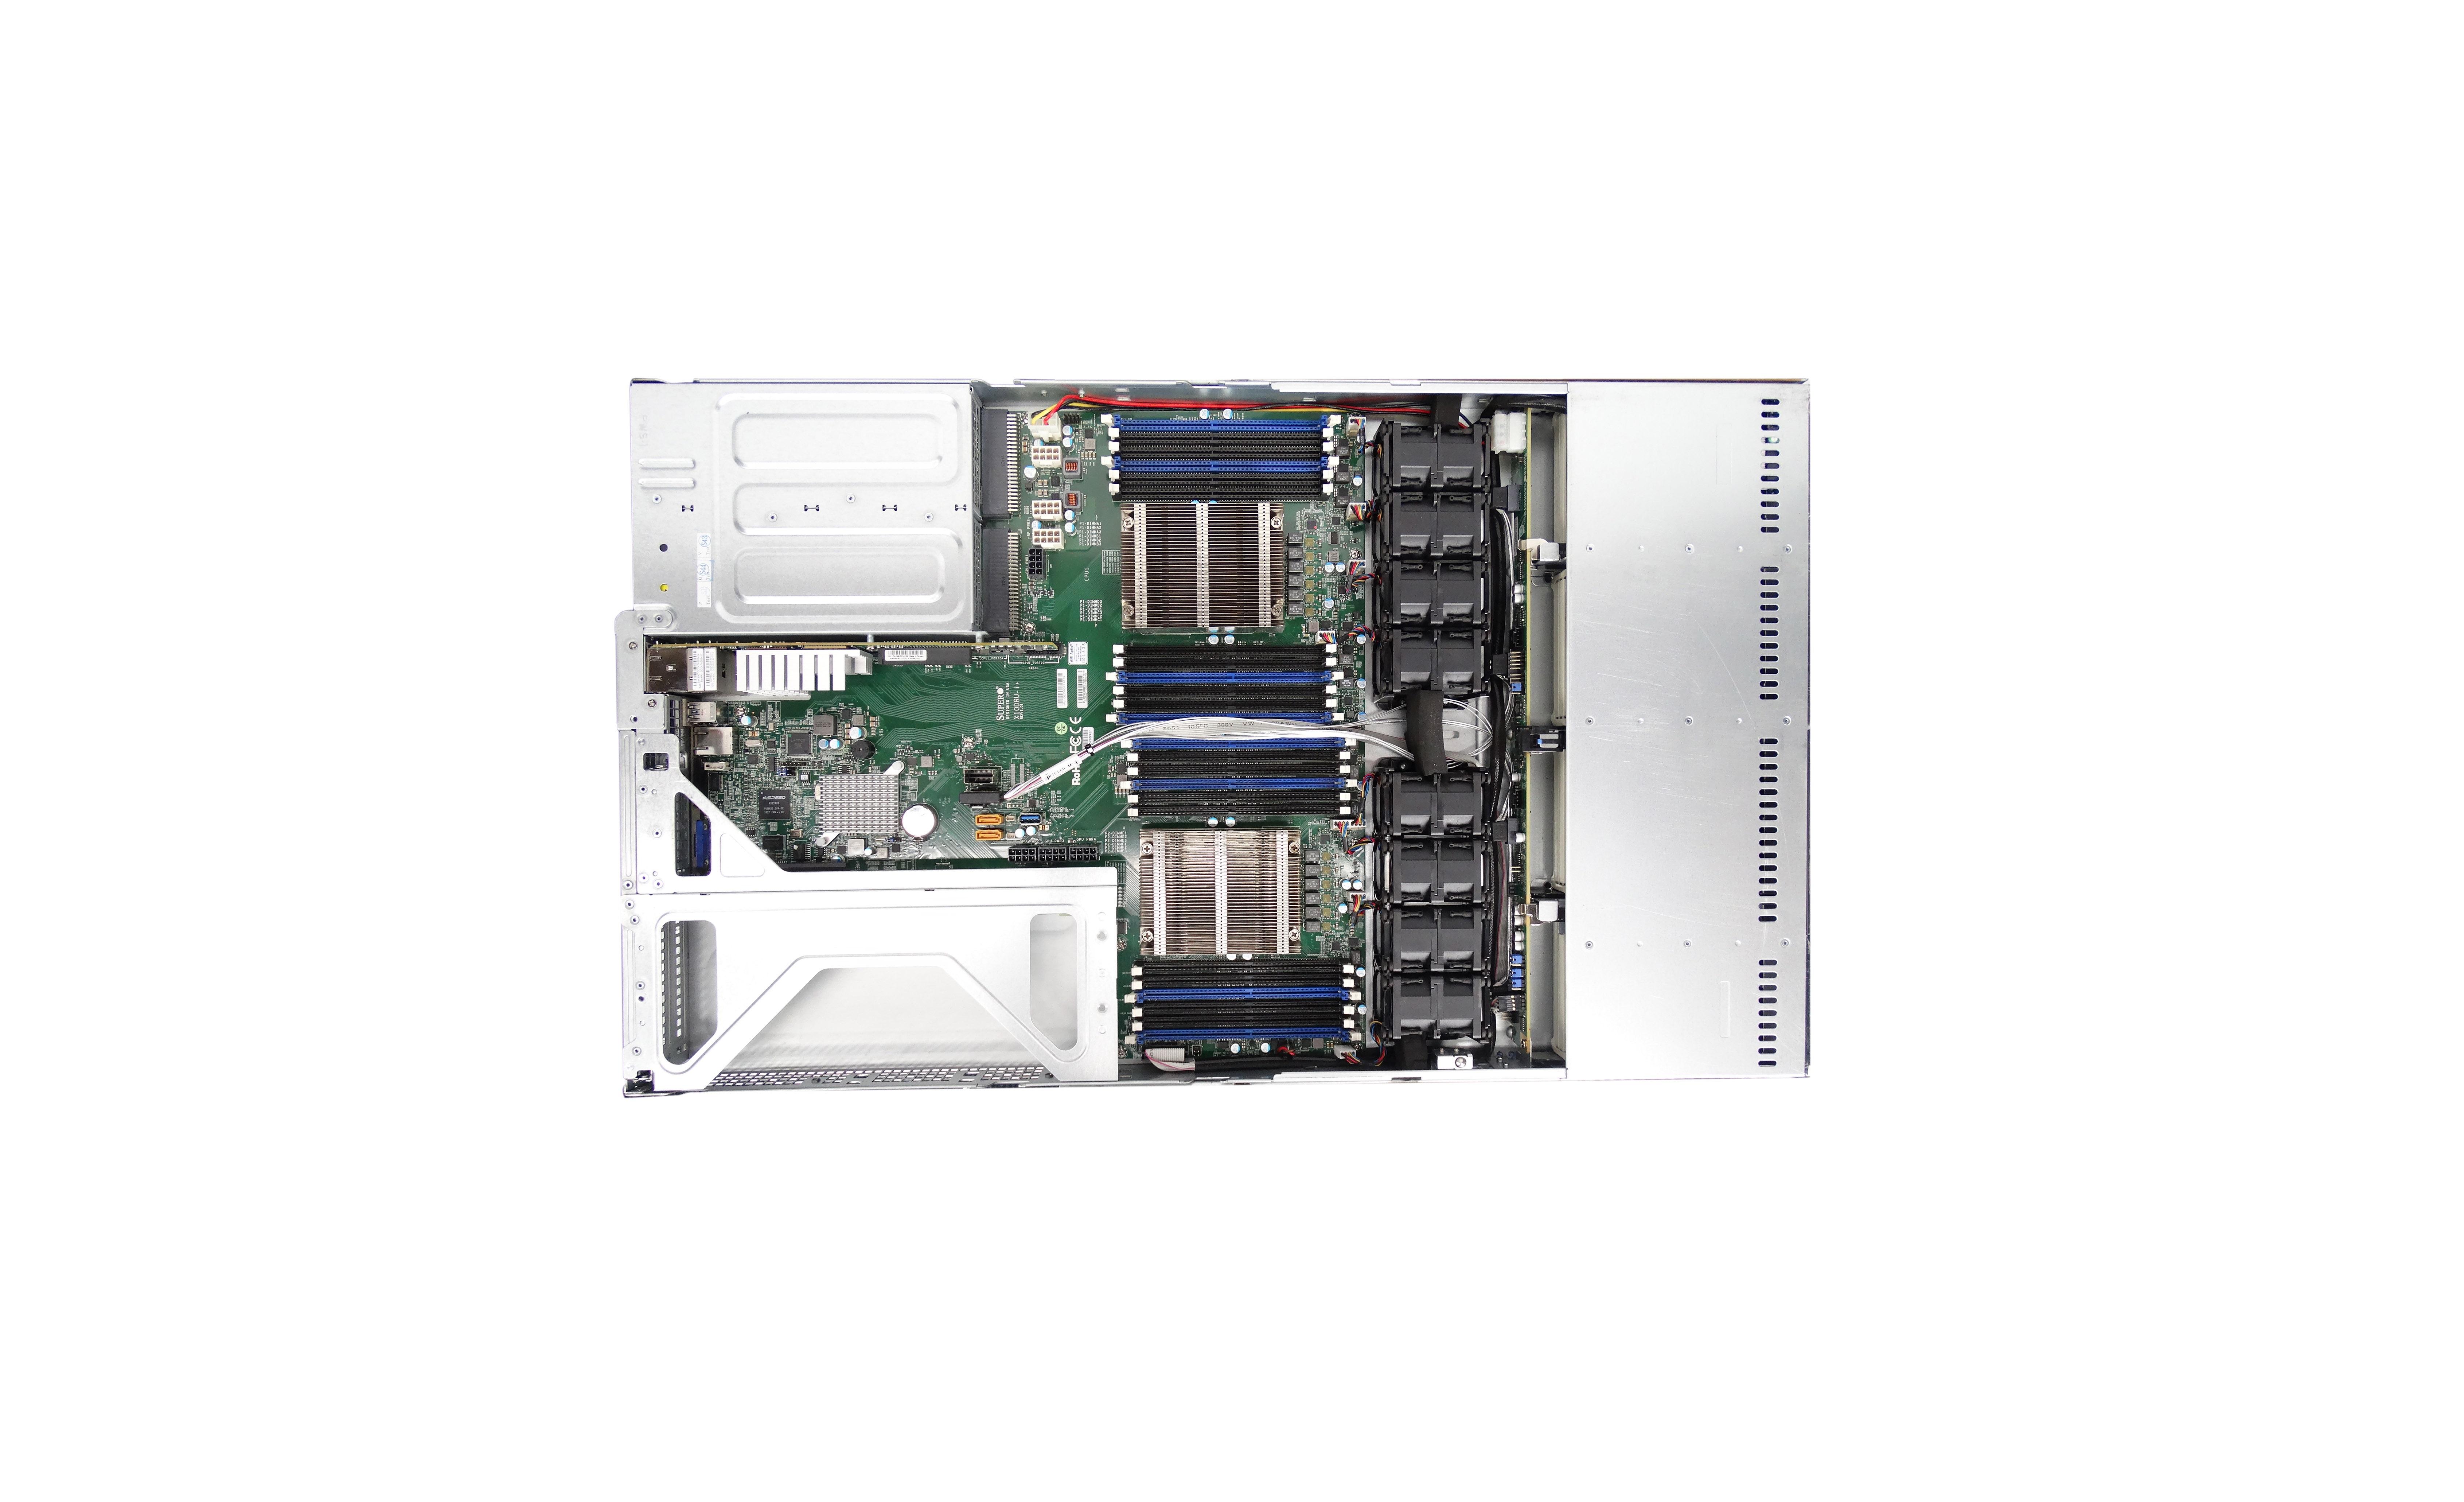 Supermicro-6018U-TR4T-4-Bay-1U-2x-Xeon-E5-2650V3-2-3GHz-10C-32GB-4x-1TB-SATA thumbnail 3